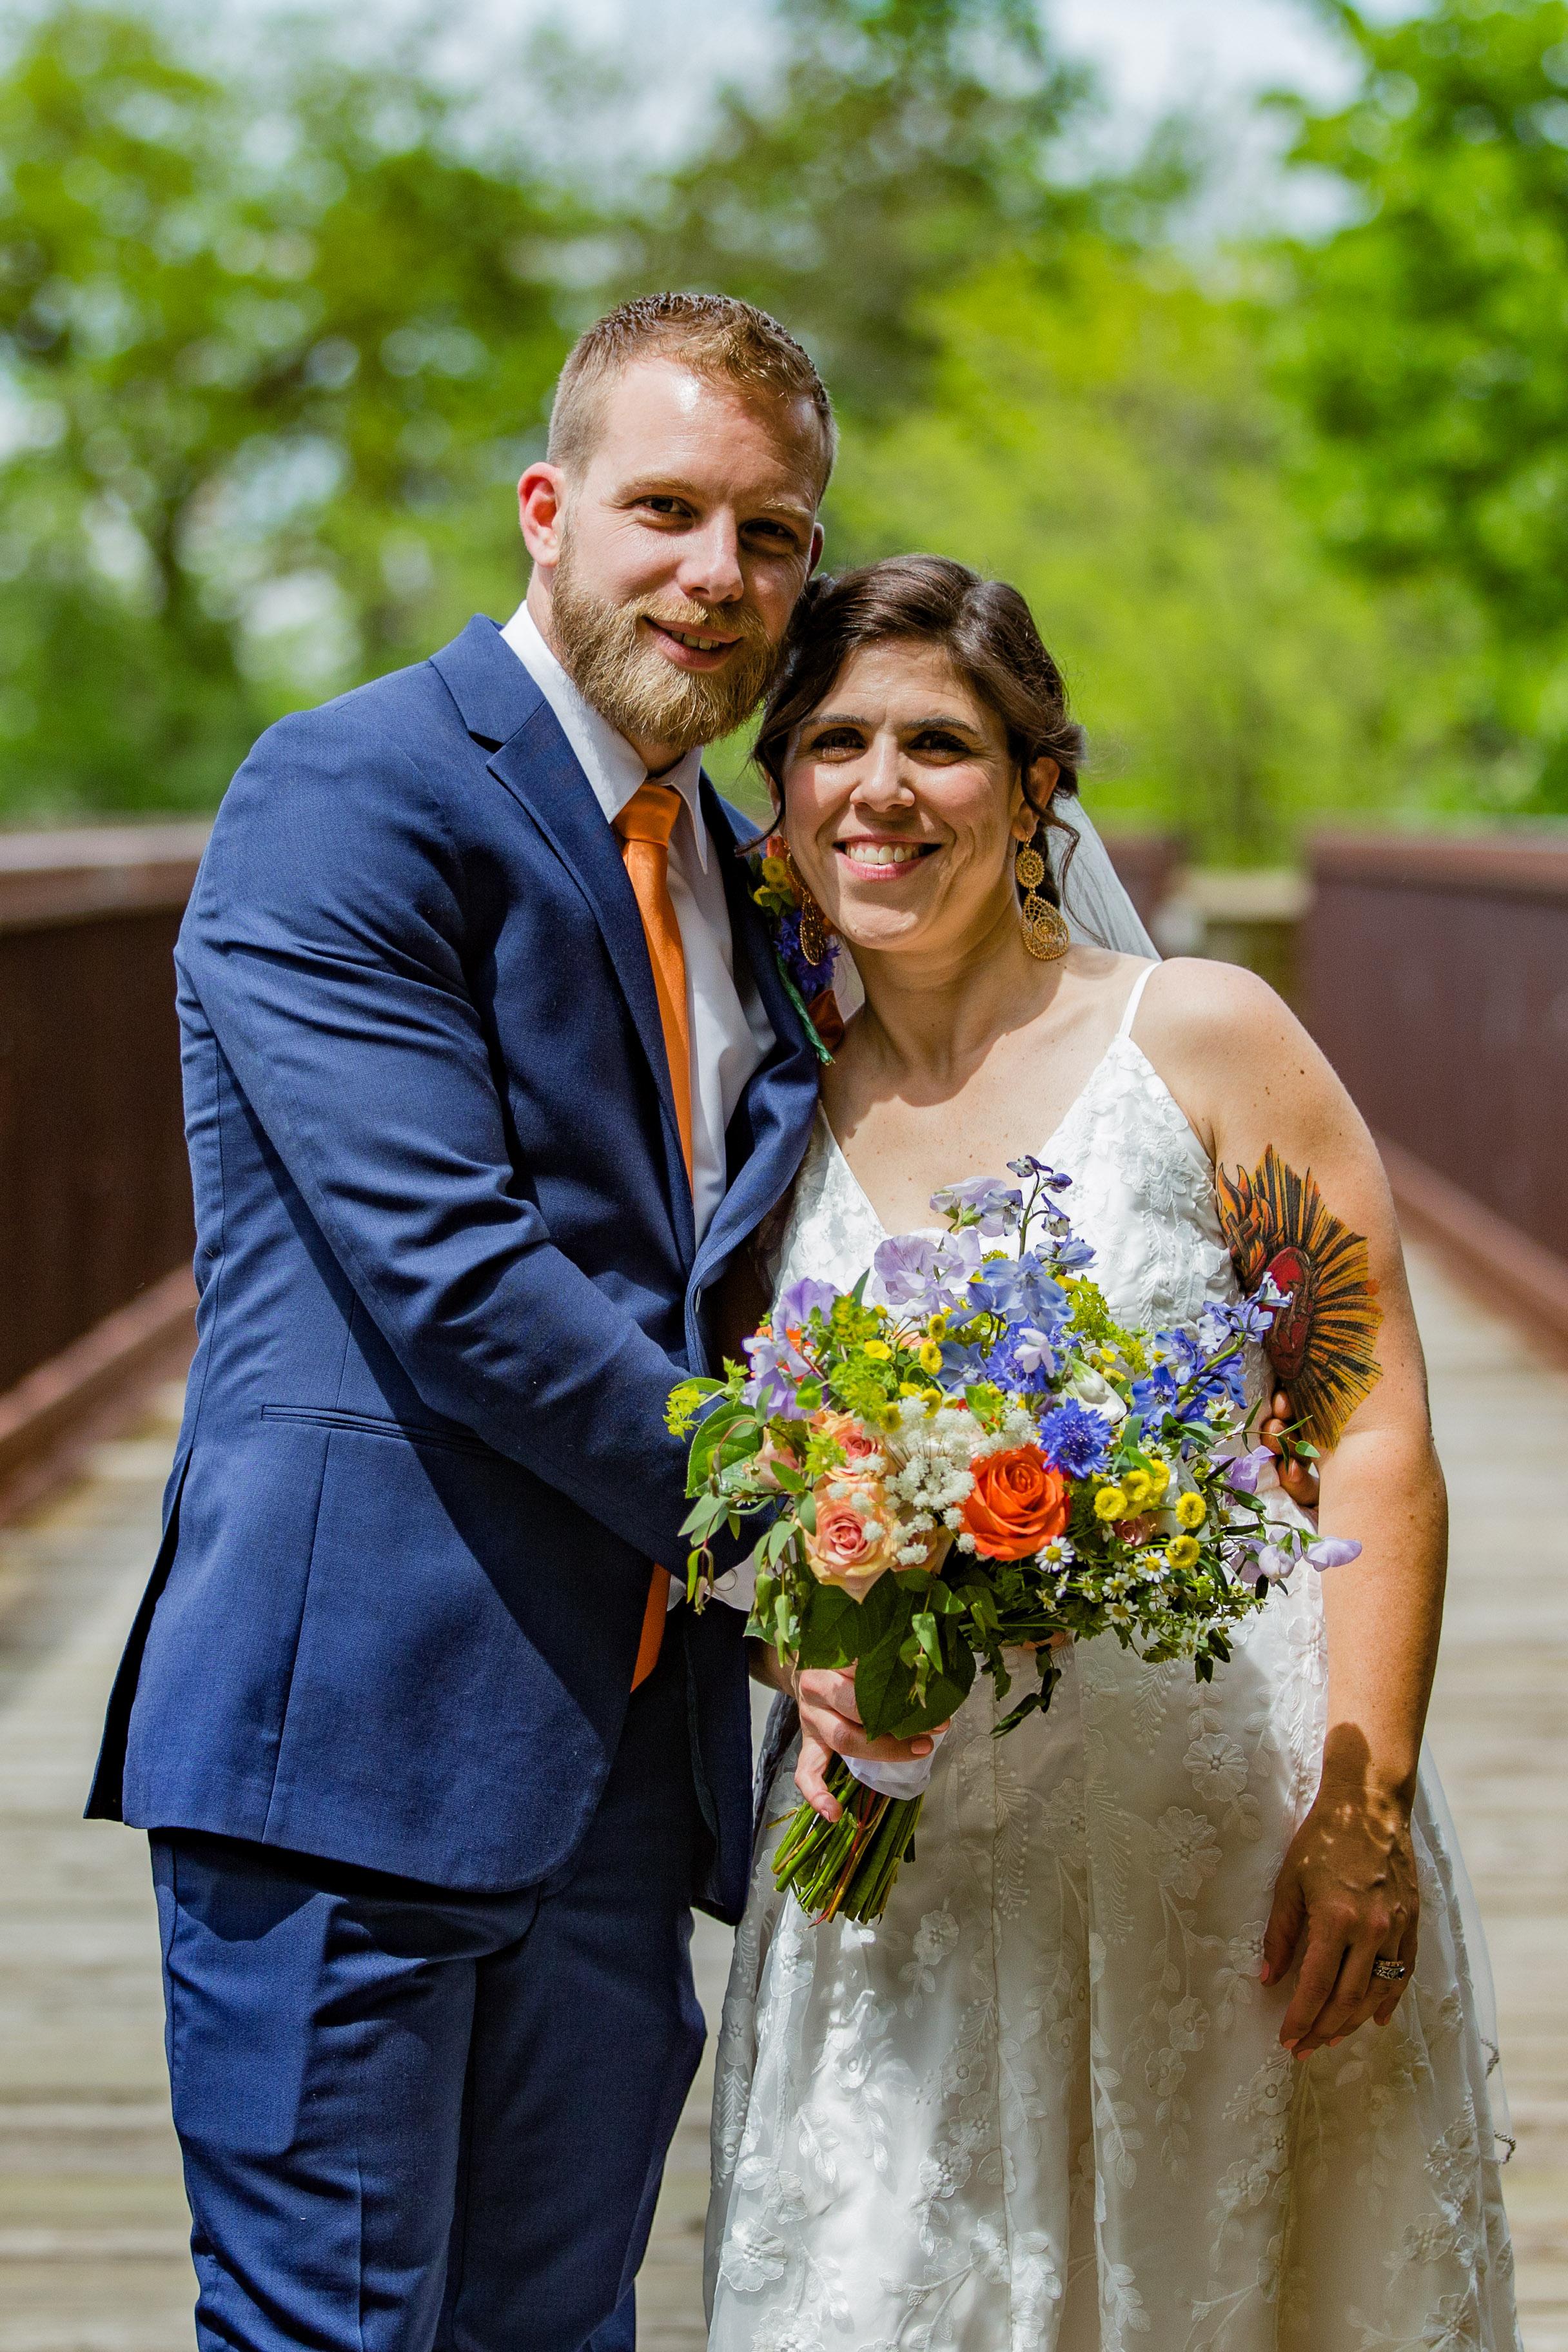 Natalie and Dallas Mooney Wedding 6-8-19_Tania Watt Photography-226.jpg